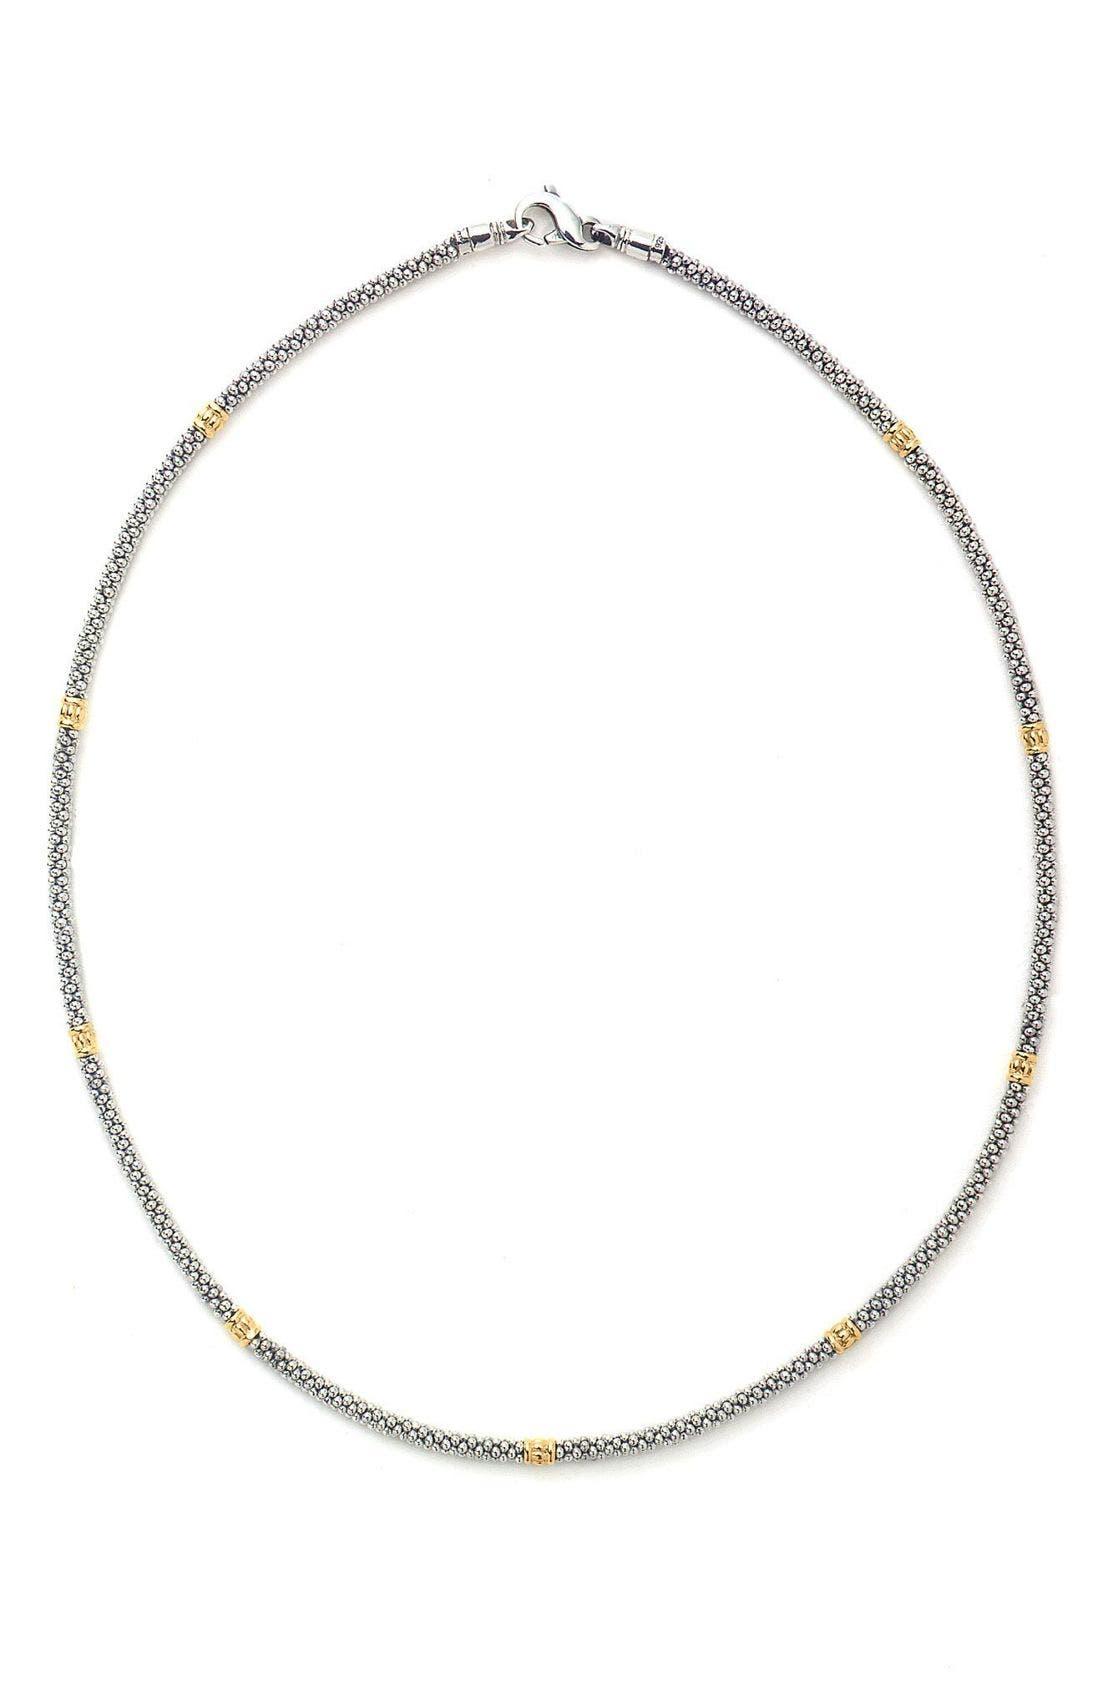 Caviar Rope Necklace,                         Main,                         color,